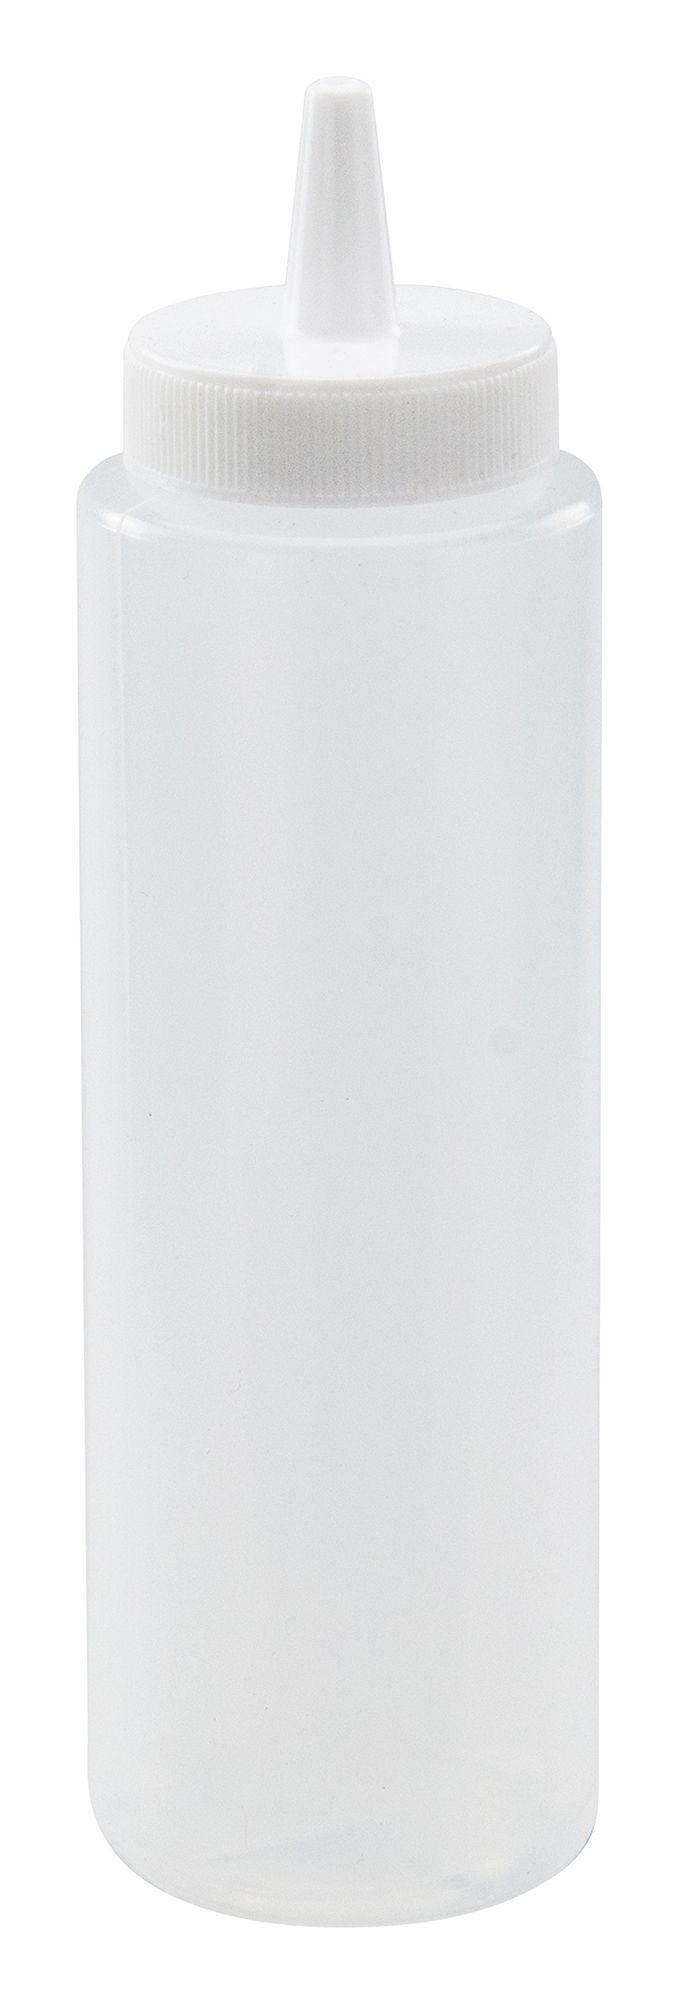 Winco PSB-08C Clear Plastic 8 oz. Squeeze Dispenser